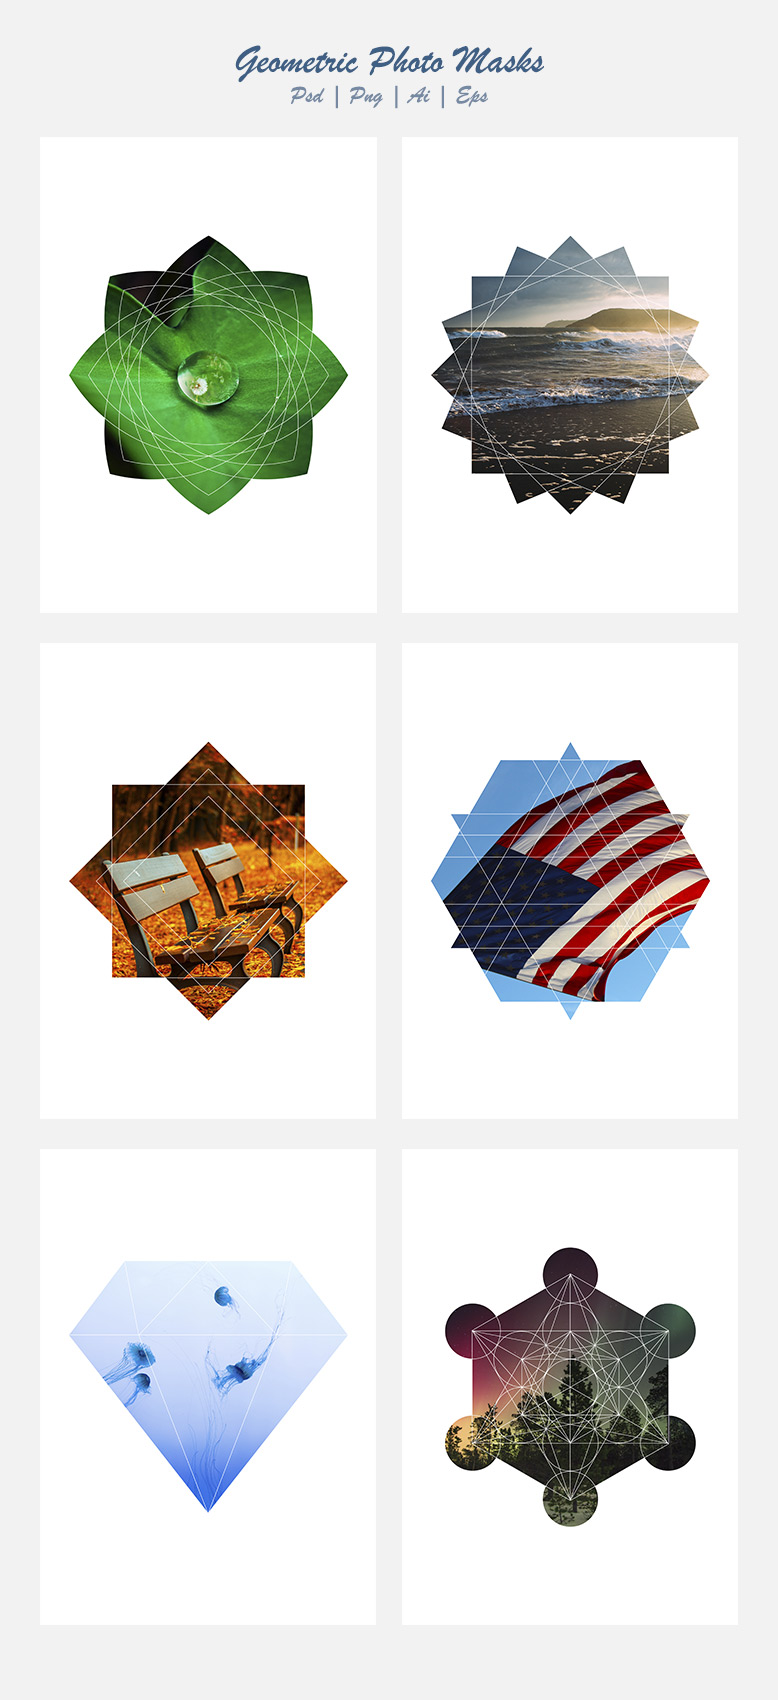 geometric-photo-masks-preview-2